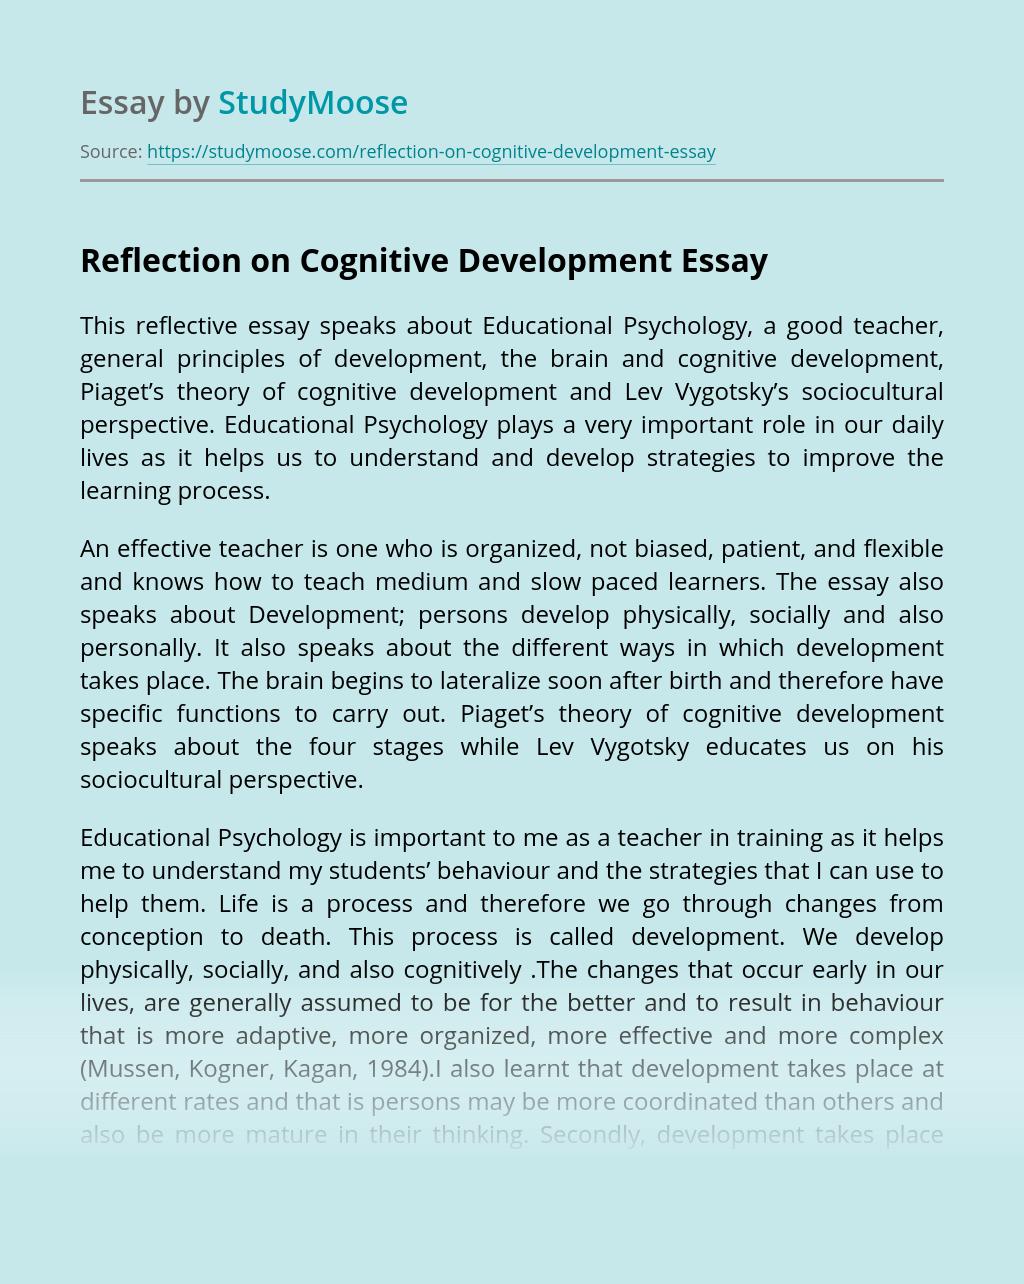 Reflection on Cognitive Development